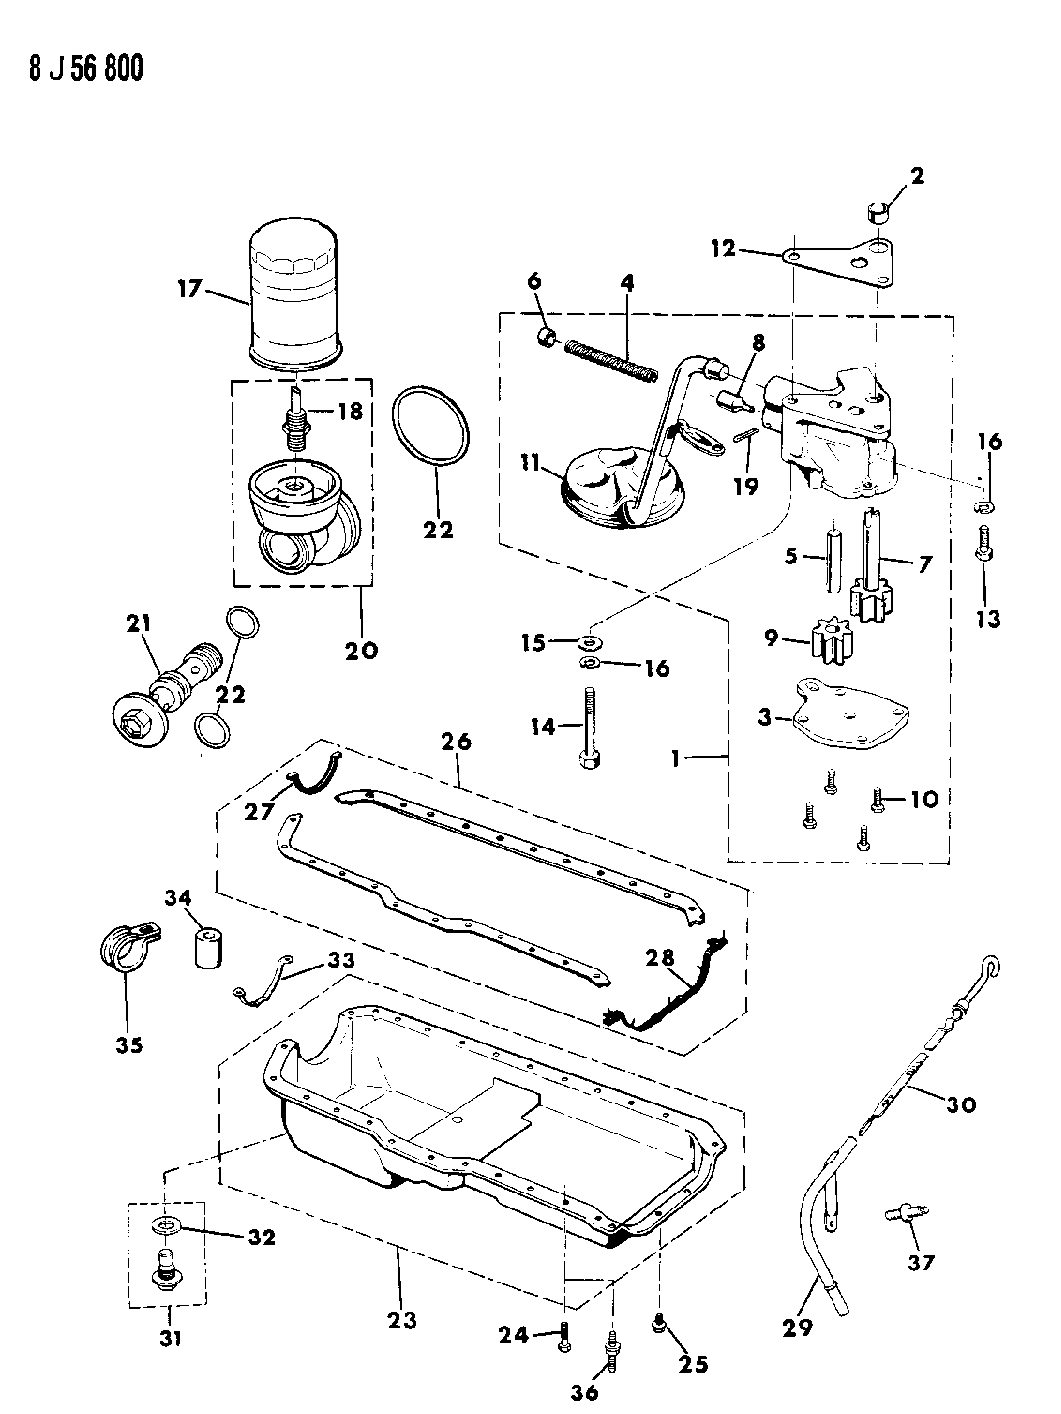 Jeep Cherokee Engine Parts Diagram